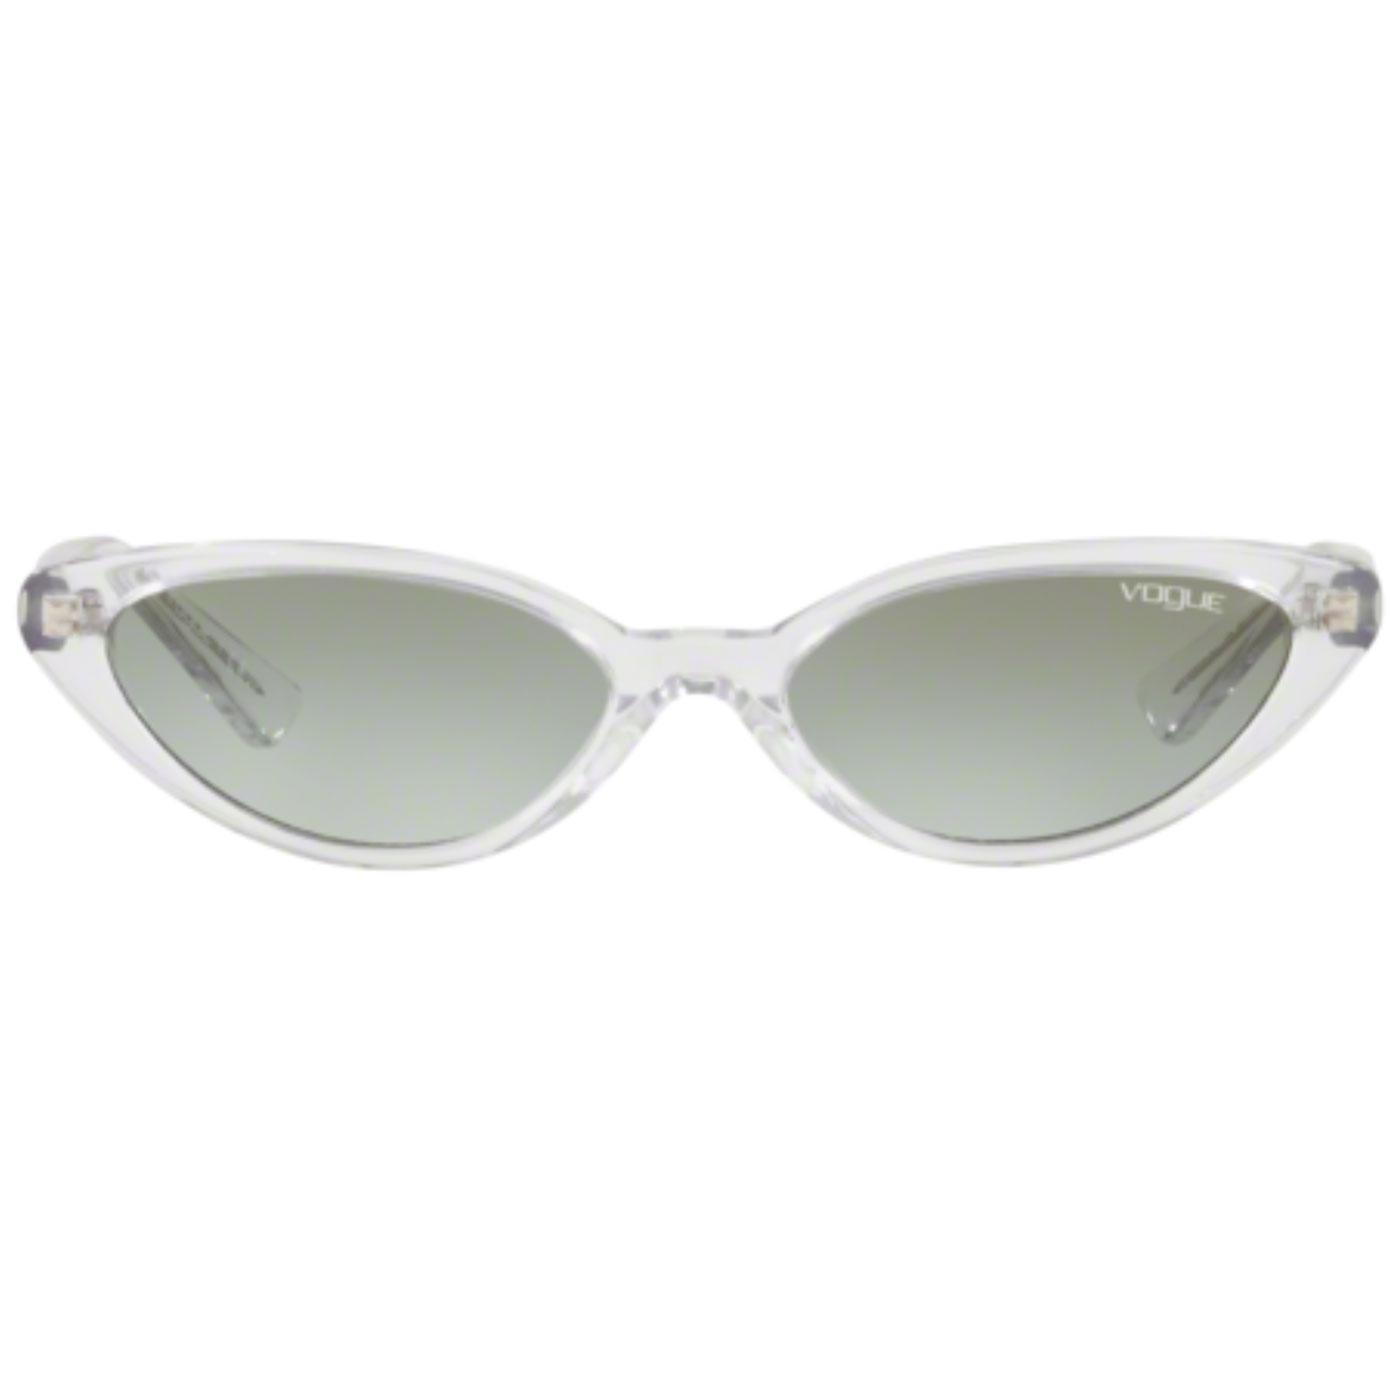 VOGUE x GIGI HADID Retro 50s Catseye Sunglasses T